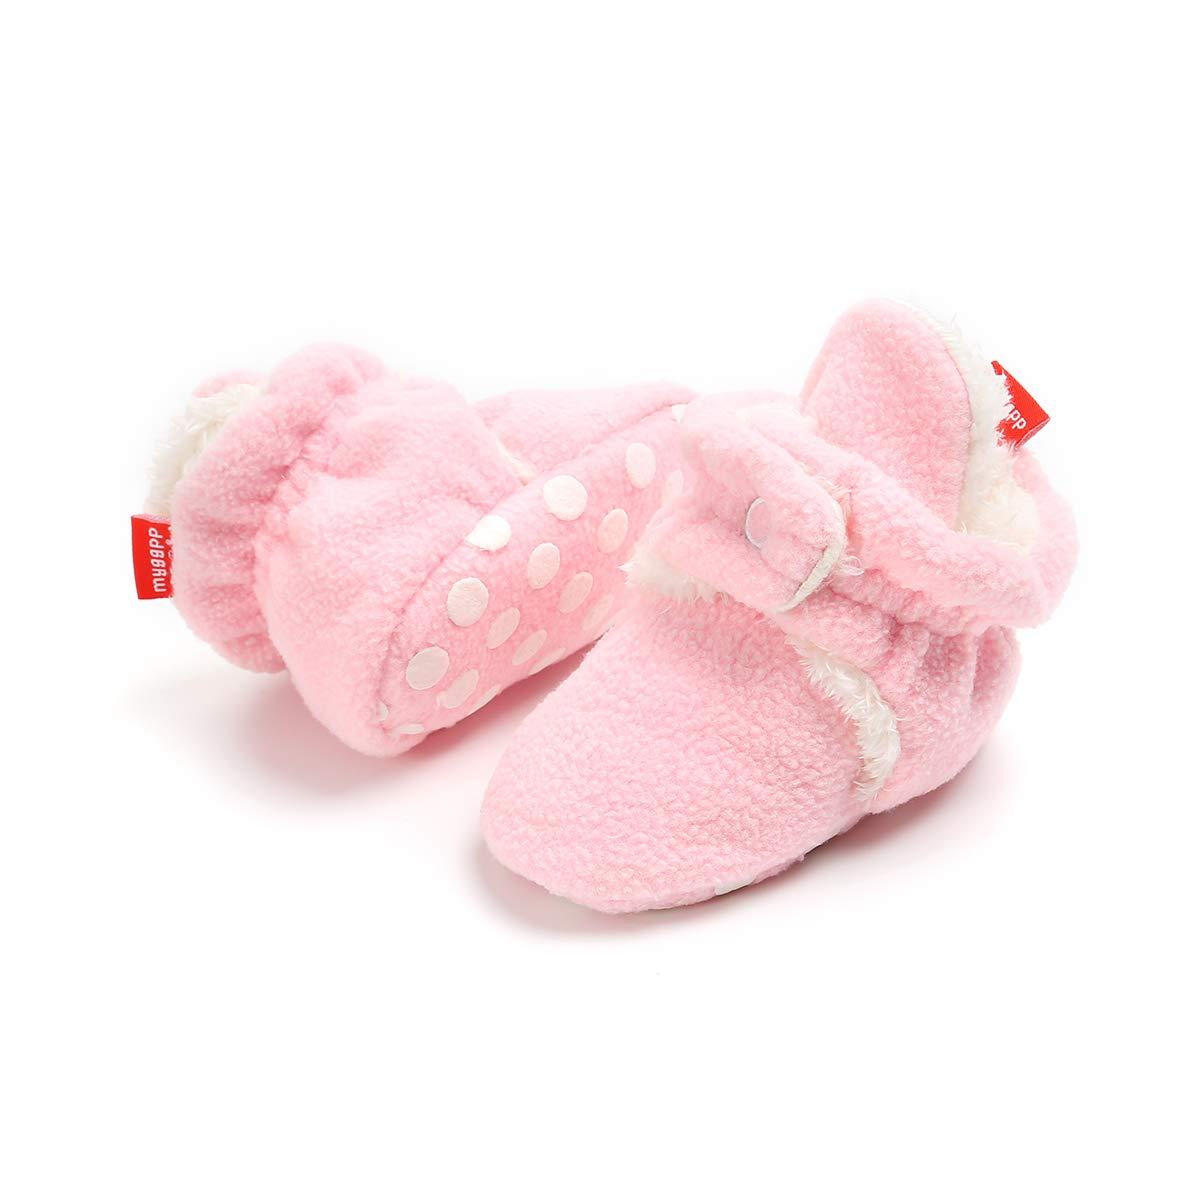 Newborn Baby Boys Girls Fleece Booties with Anti-Slip Bottom Unisex Infant Warm Winter Socks First Walker Shoes